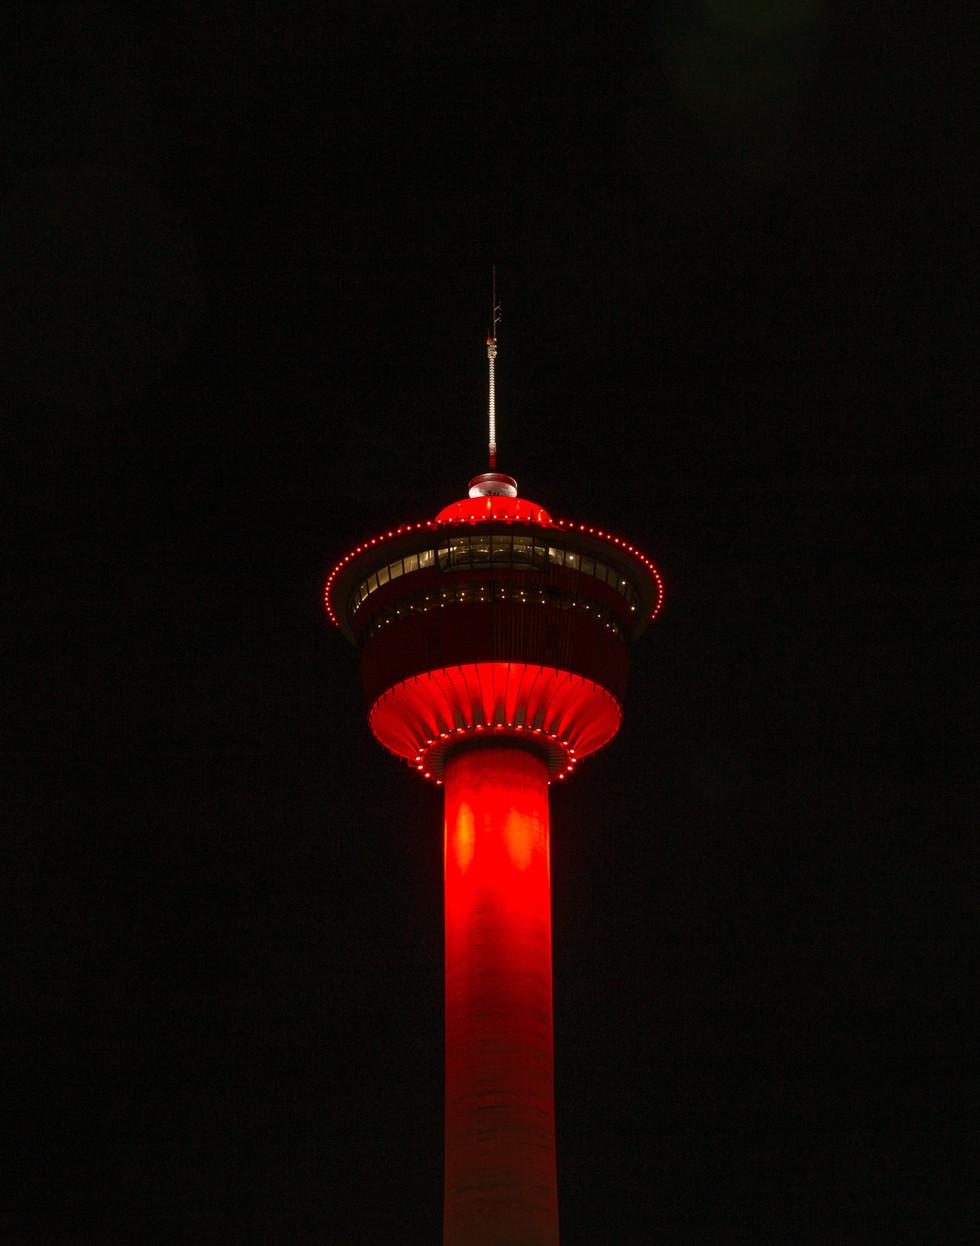 Calgary Commercial Photography - Calgary Tower